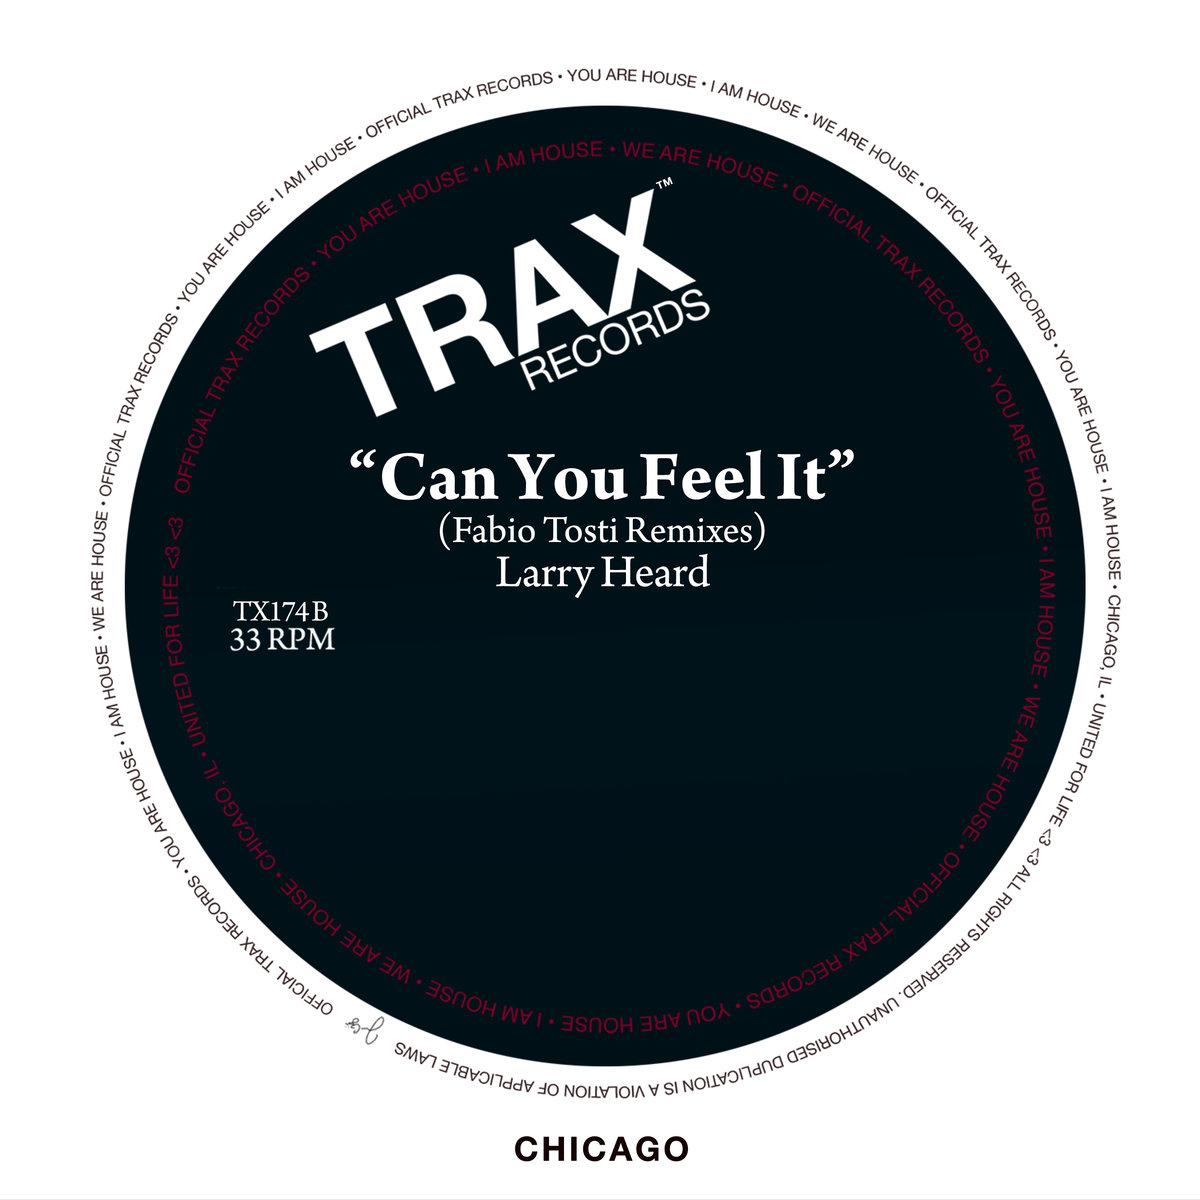 Larry Heard (Can You Feel It) Fabio Tosti Remixes